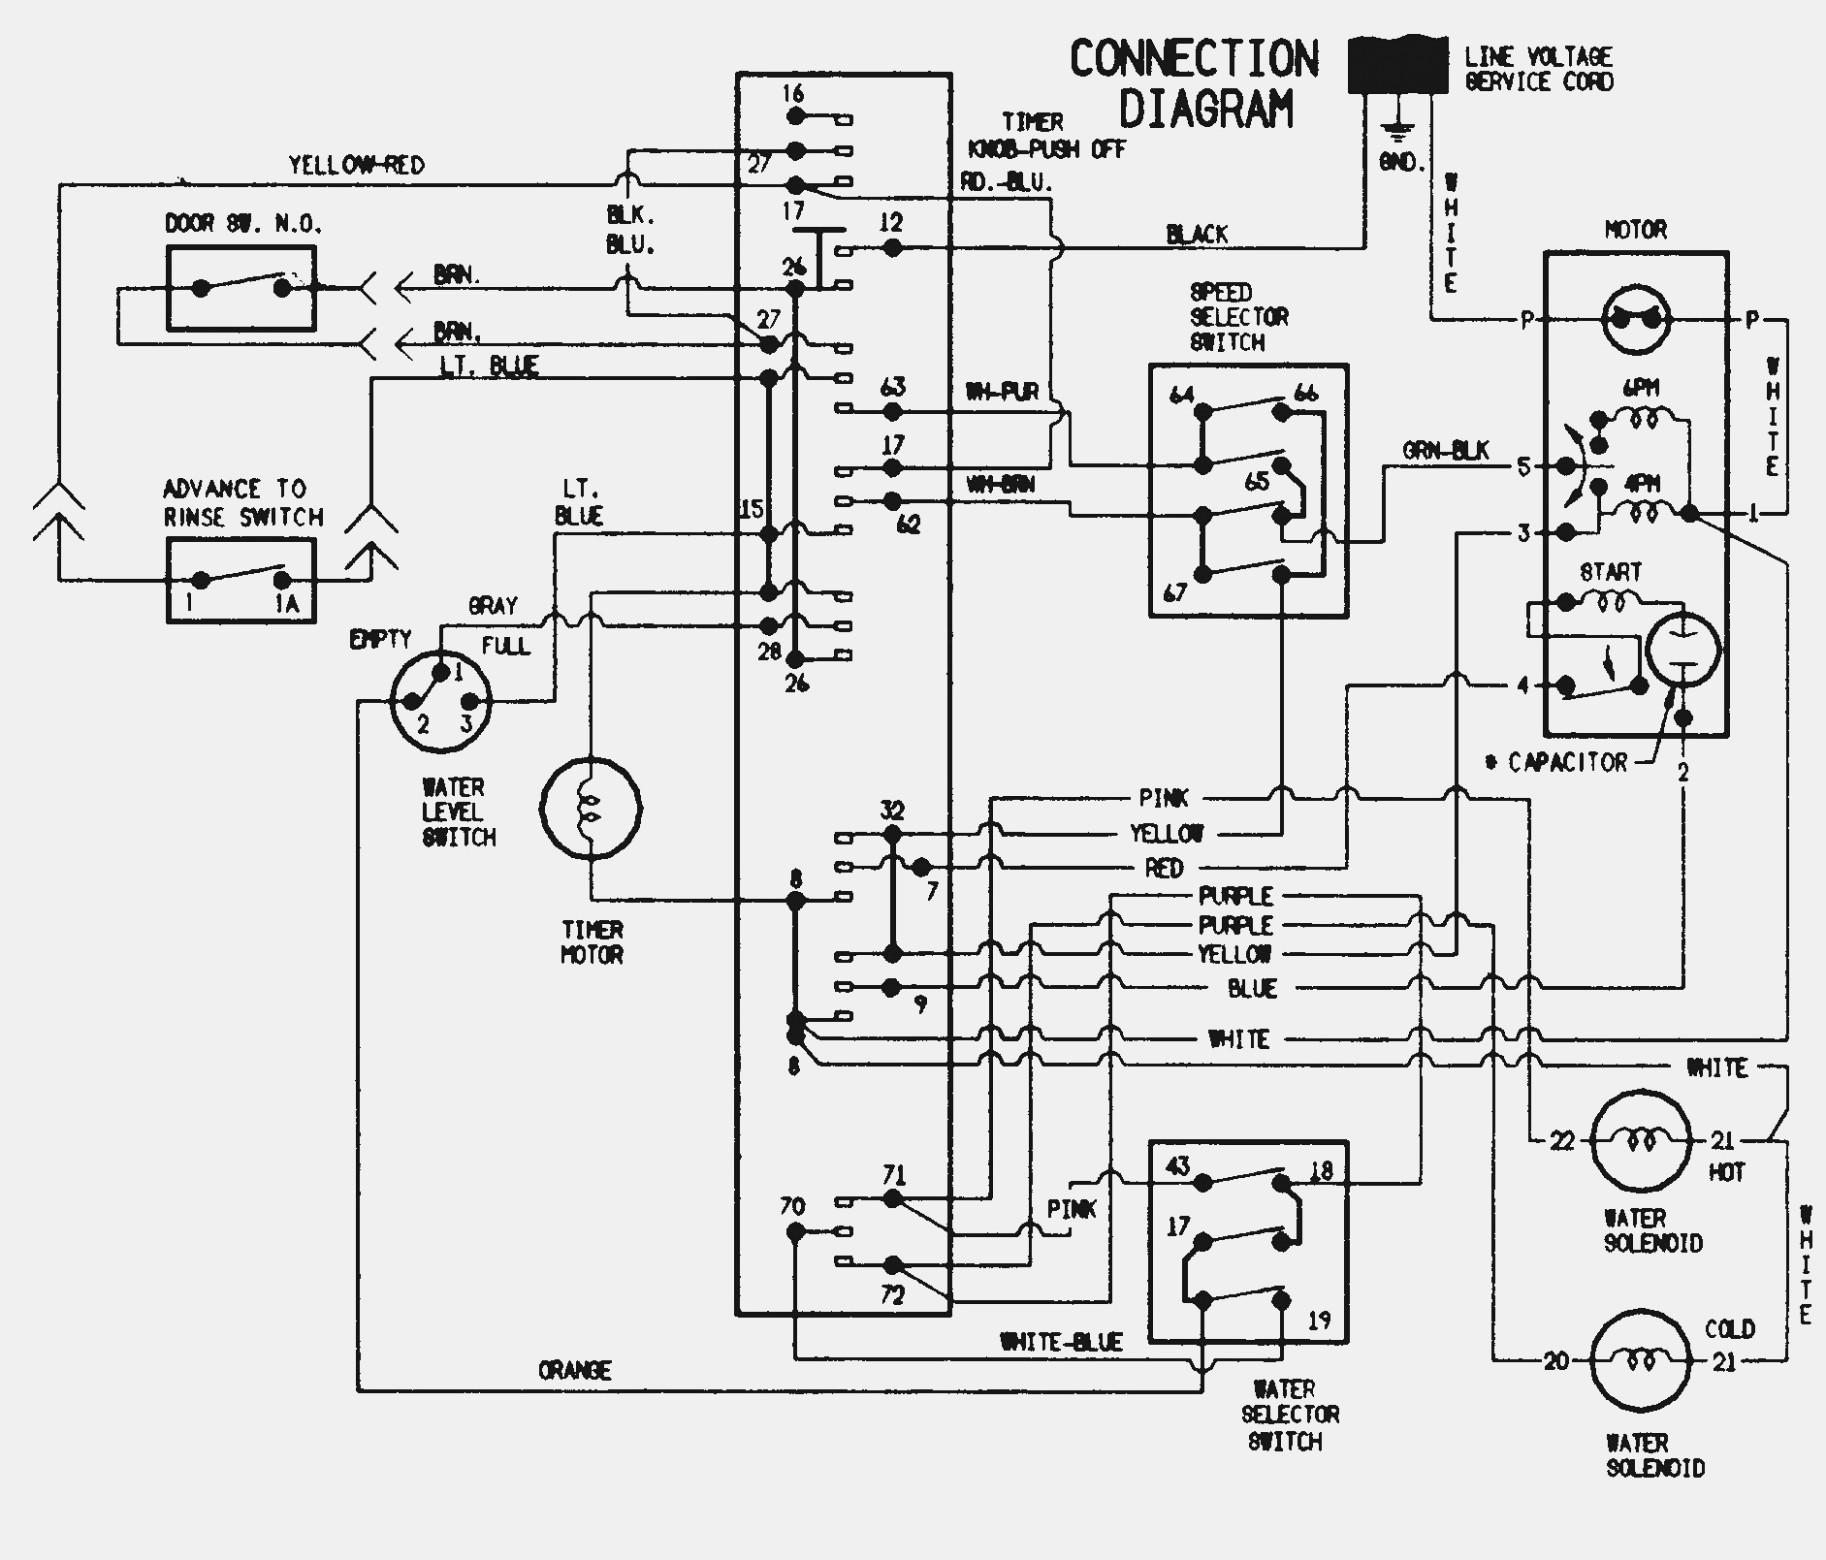 [WQZT_9871]  DIAGRAM] Alien Wii Wiring Diagram FULL Version HD Quality Wiring Diagram -  NUDEDATABASE.CONSERVATOIRE-CHANTERIE.FR | Alien Wii Wiring Diagram |  | Conservatoire de la Chanterie